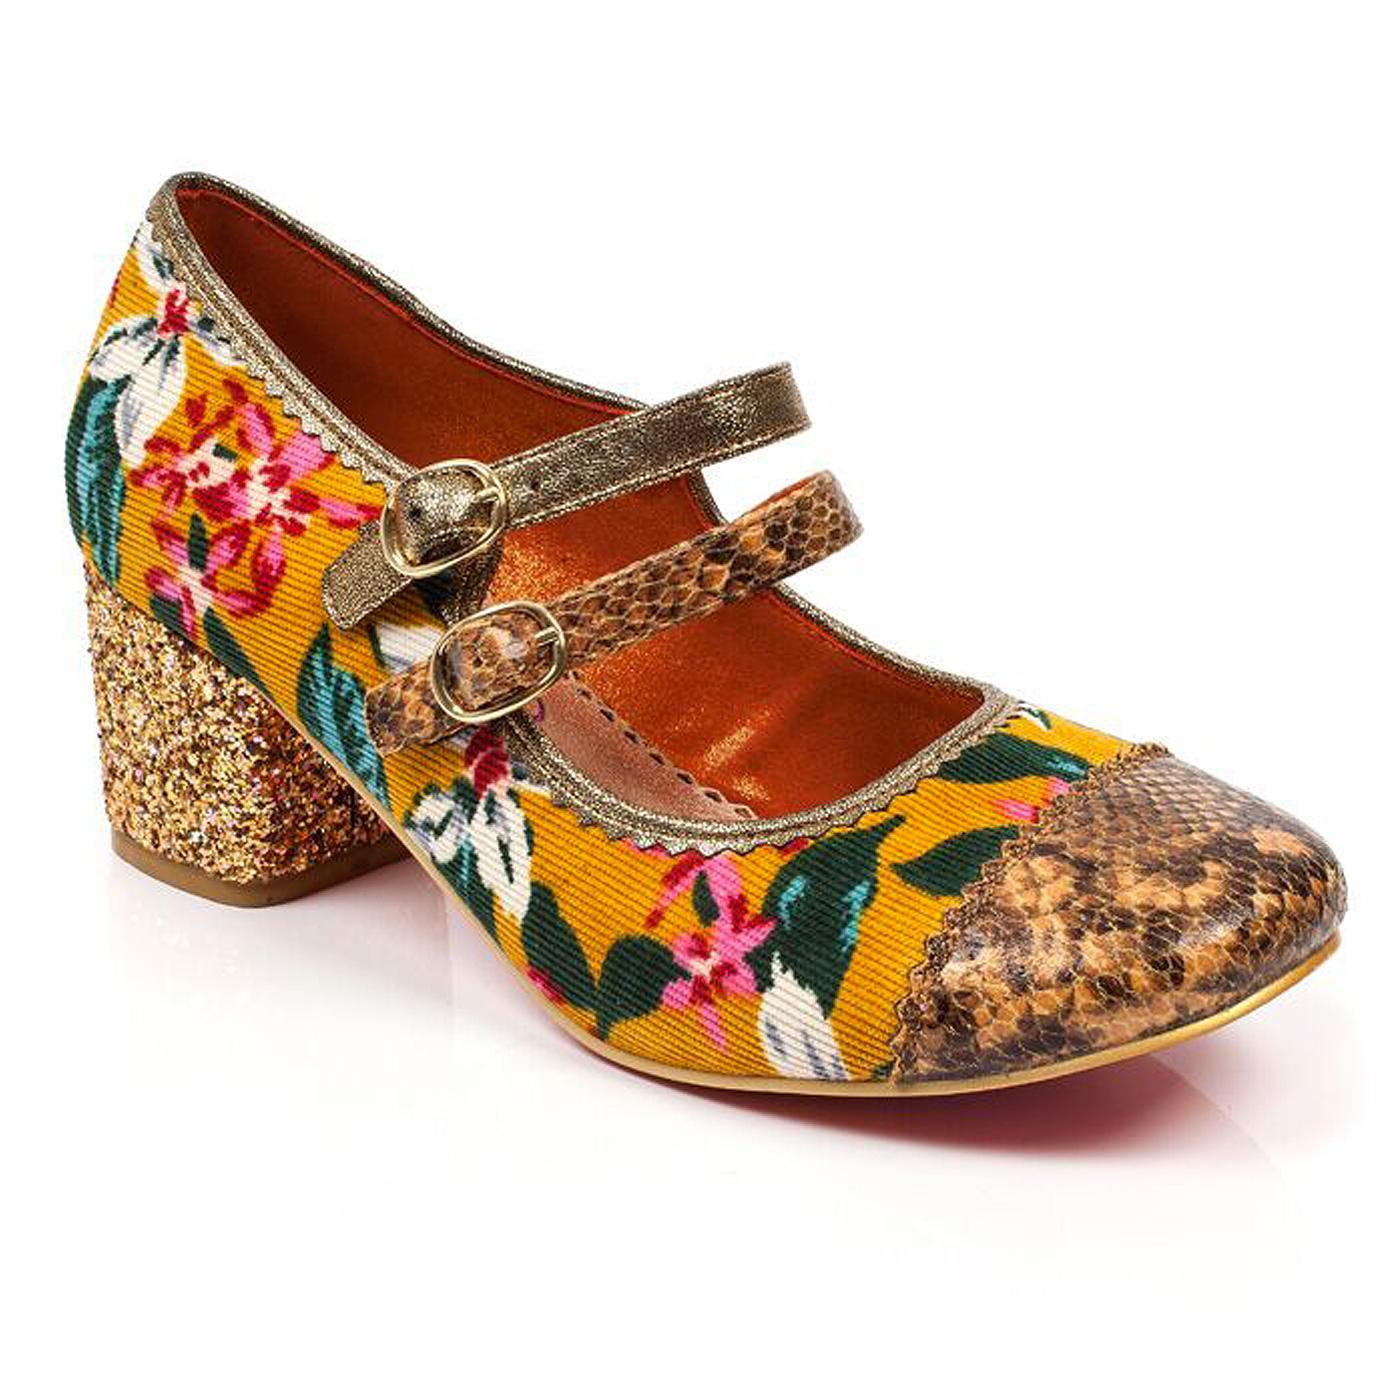 Mini Mod POETIC LICENCE Floral 60s Heels - Mustard